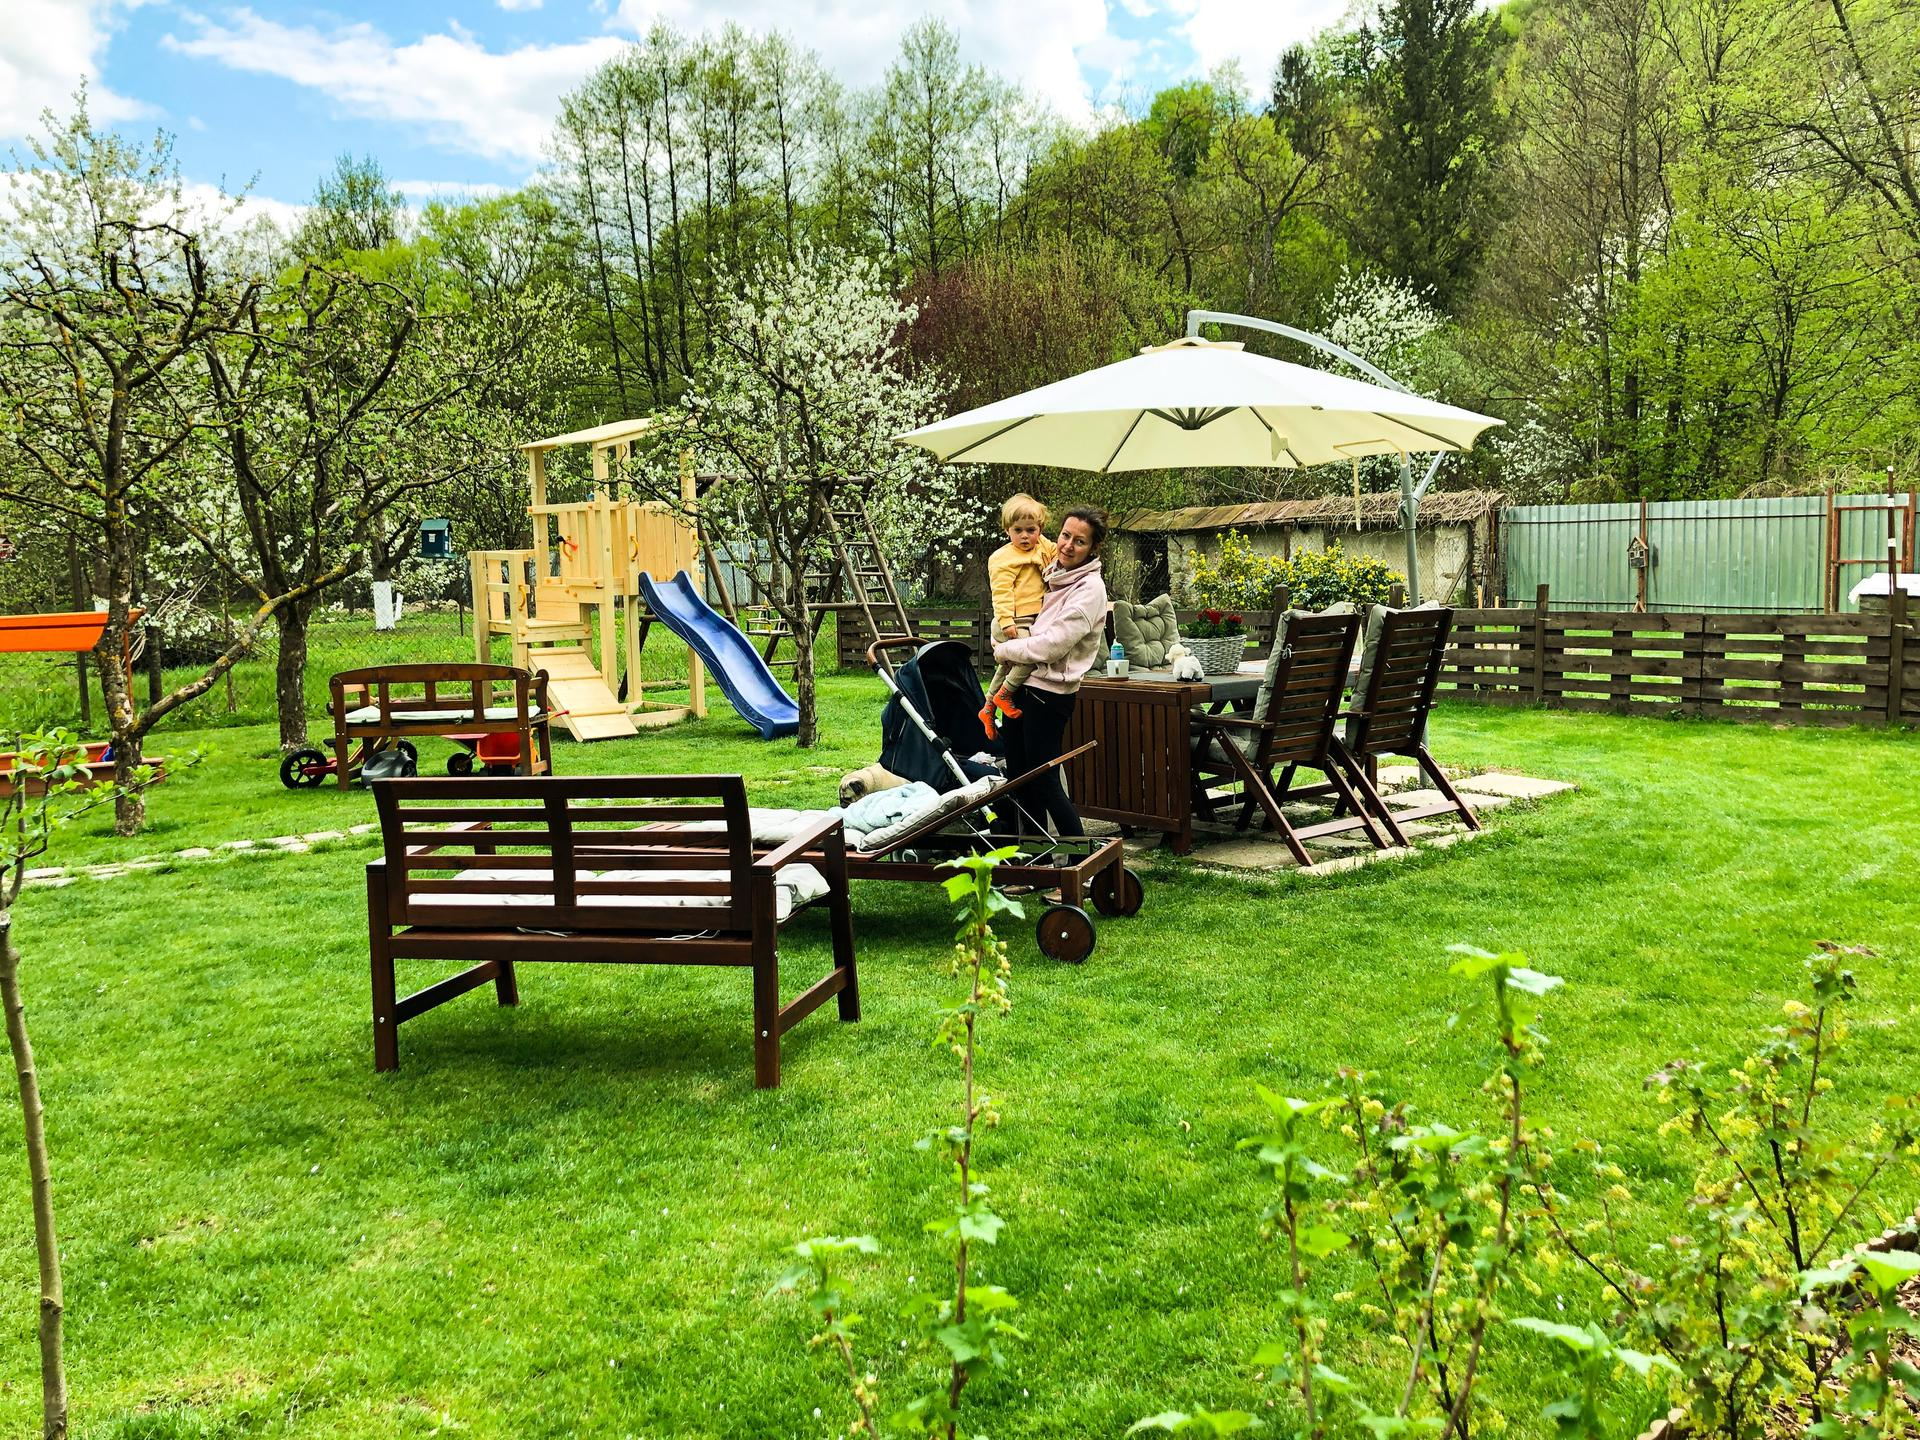 Zahrada a upravy okolo domu - Takze phase 1 a summer setup tejto casti zahrady hotovy, dokoncime hospodarsku cast fasady a mozem rozmyslat nad prerabkou plota v kurine